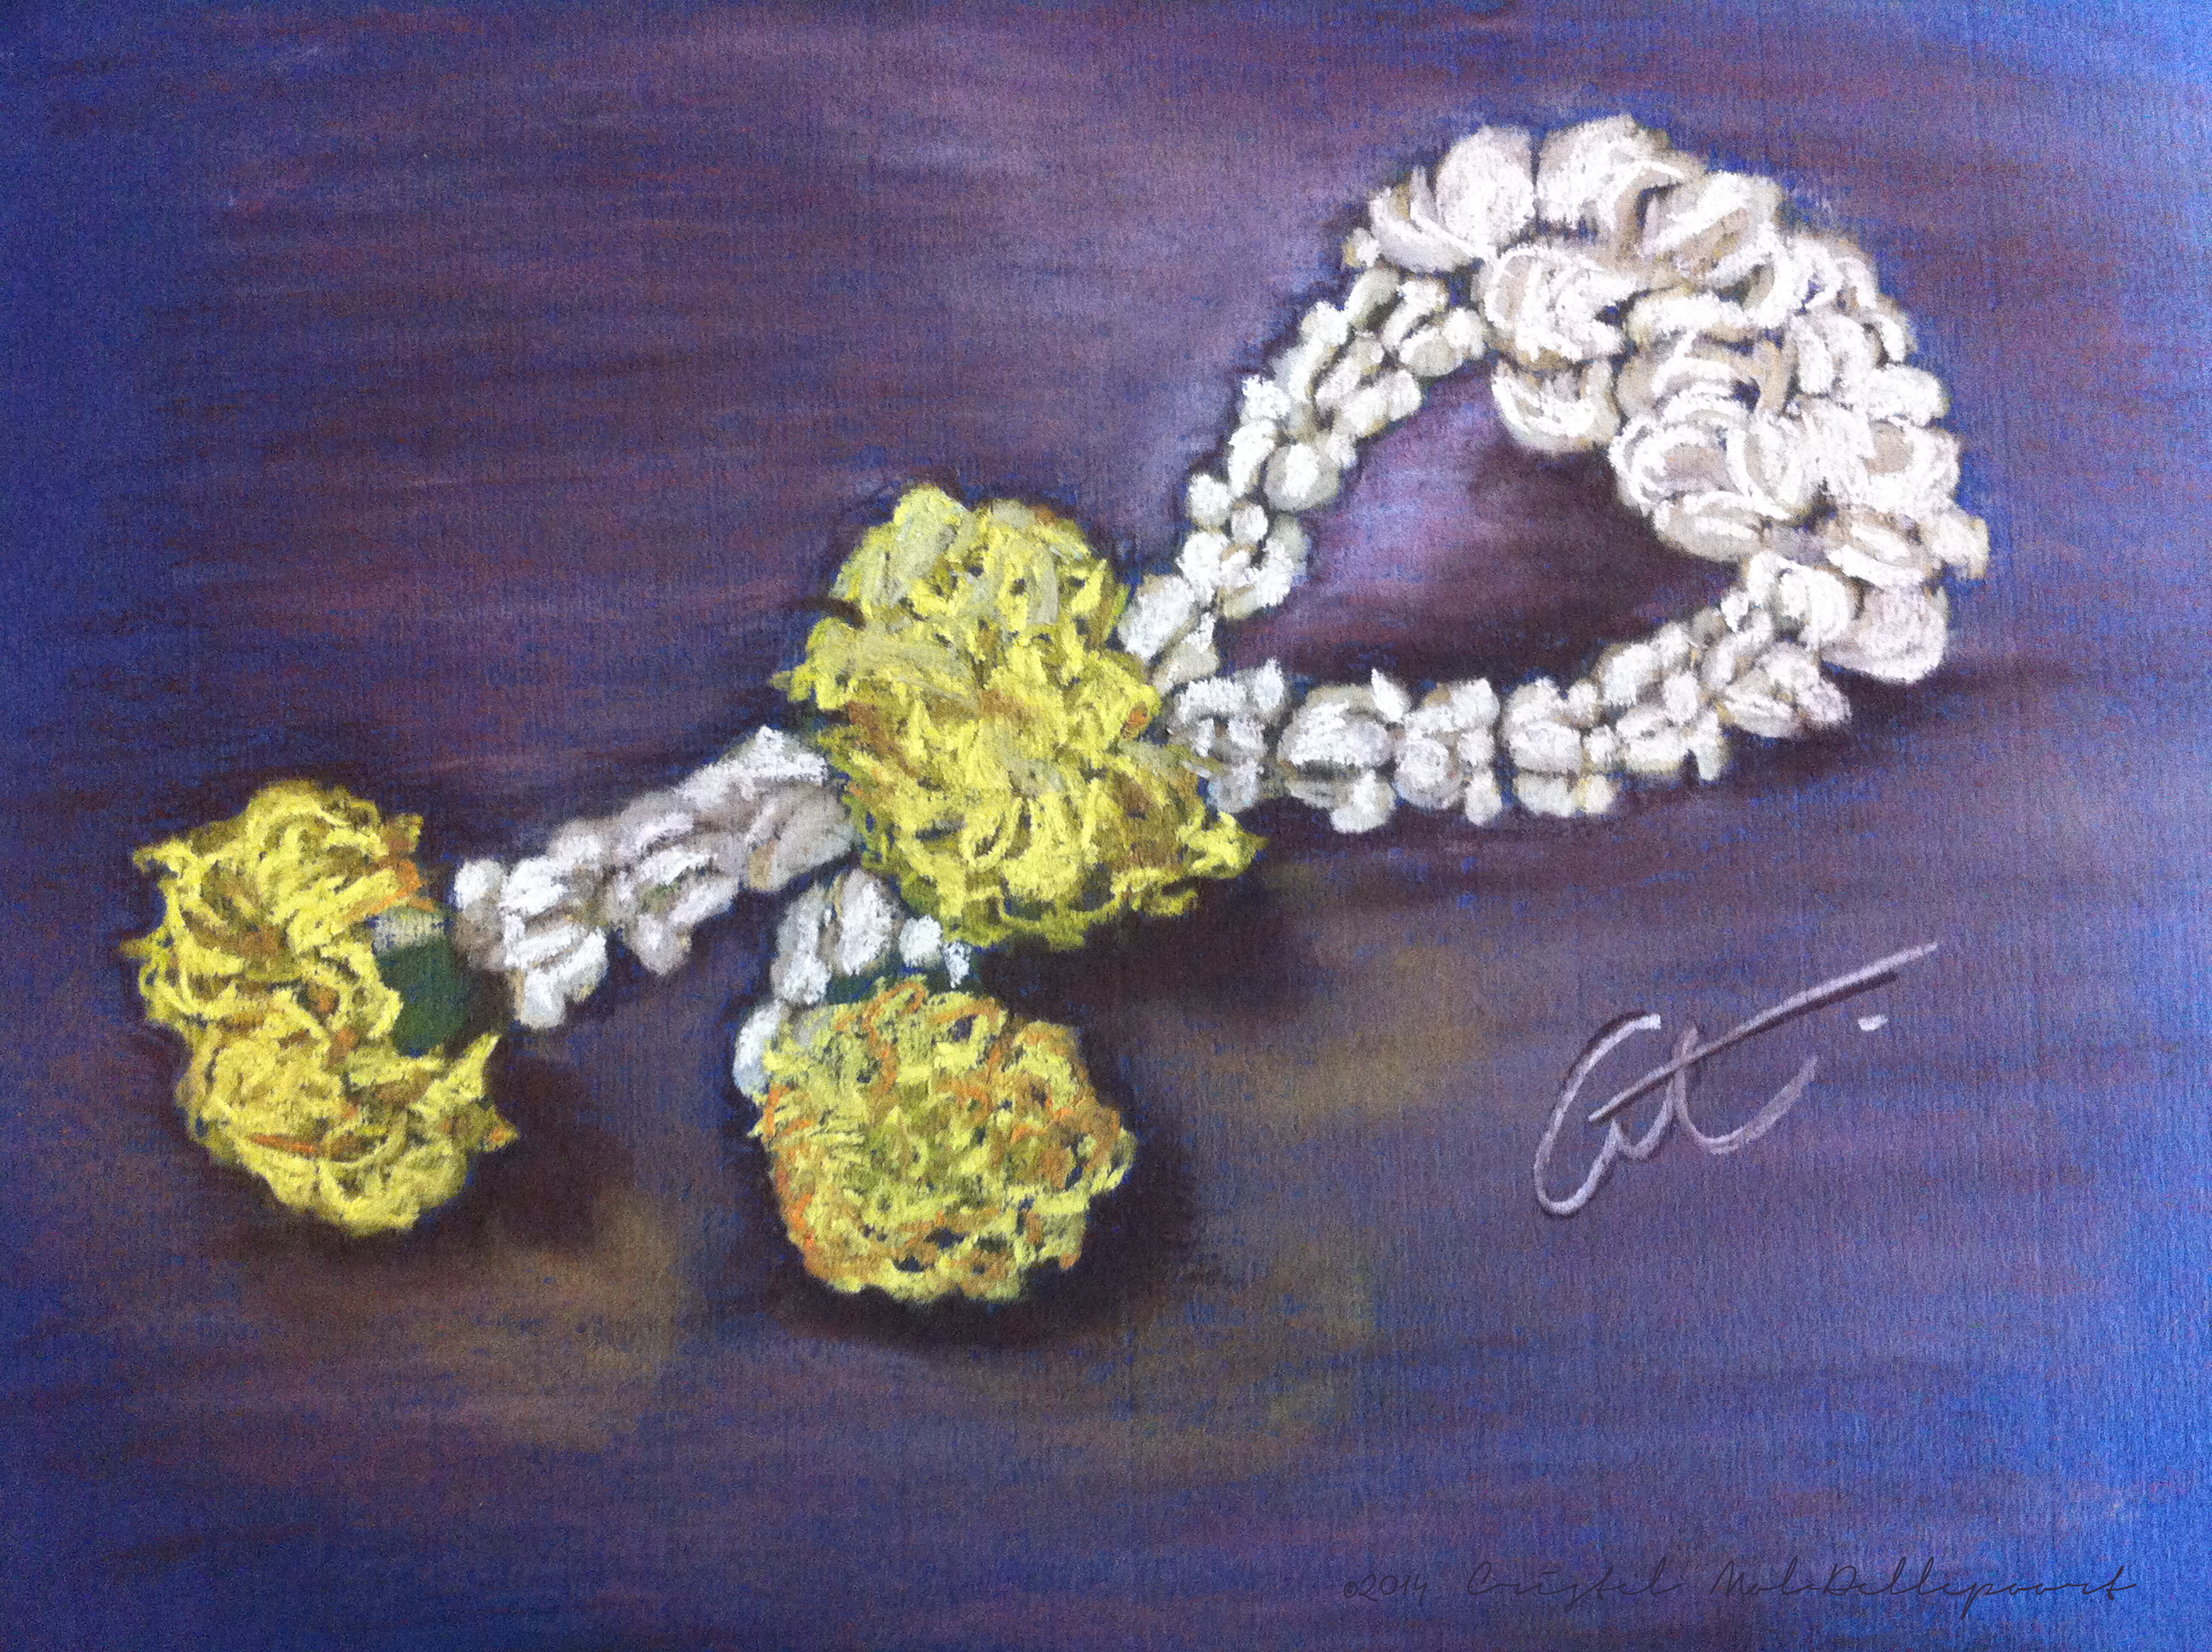 Phuang Malai Thai Jasmine Flower Garland Cristel Mol Dellepoort